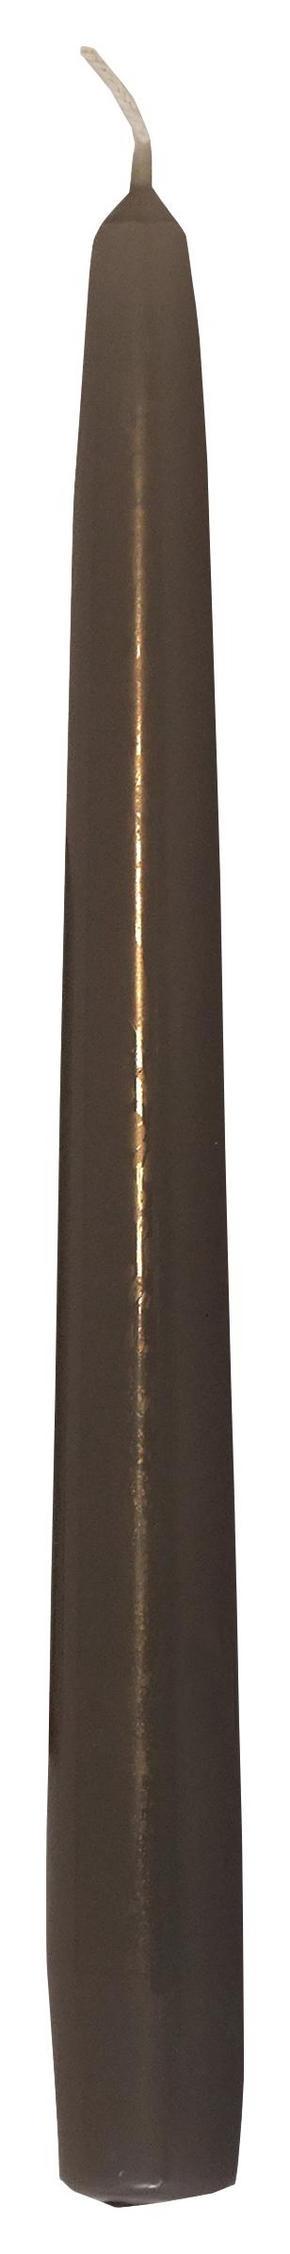 KRONLJUS - mullvadsfärgad/gråbrun, Basics (24cm) - Steinhart